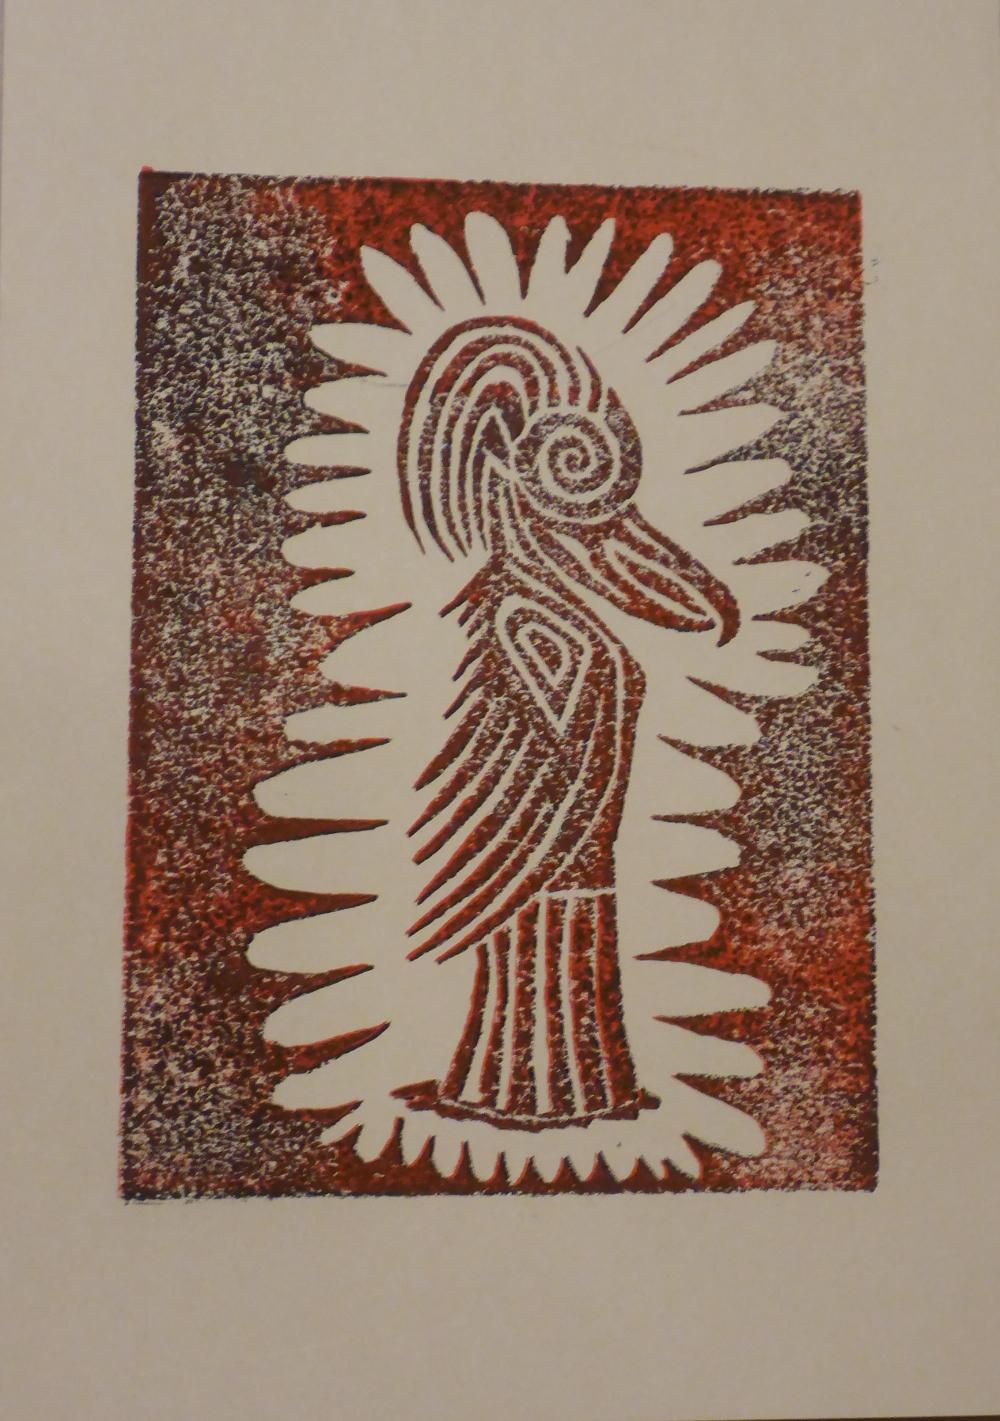 """Eris III"", 2018, Linolschnitt auf Papier, 21 x 30 cm"